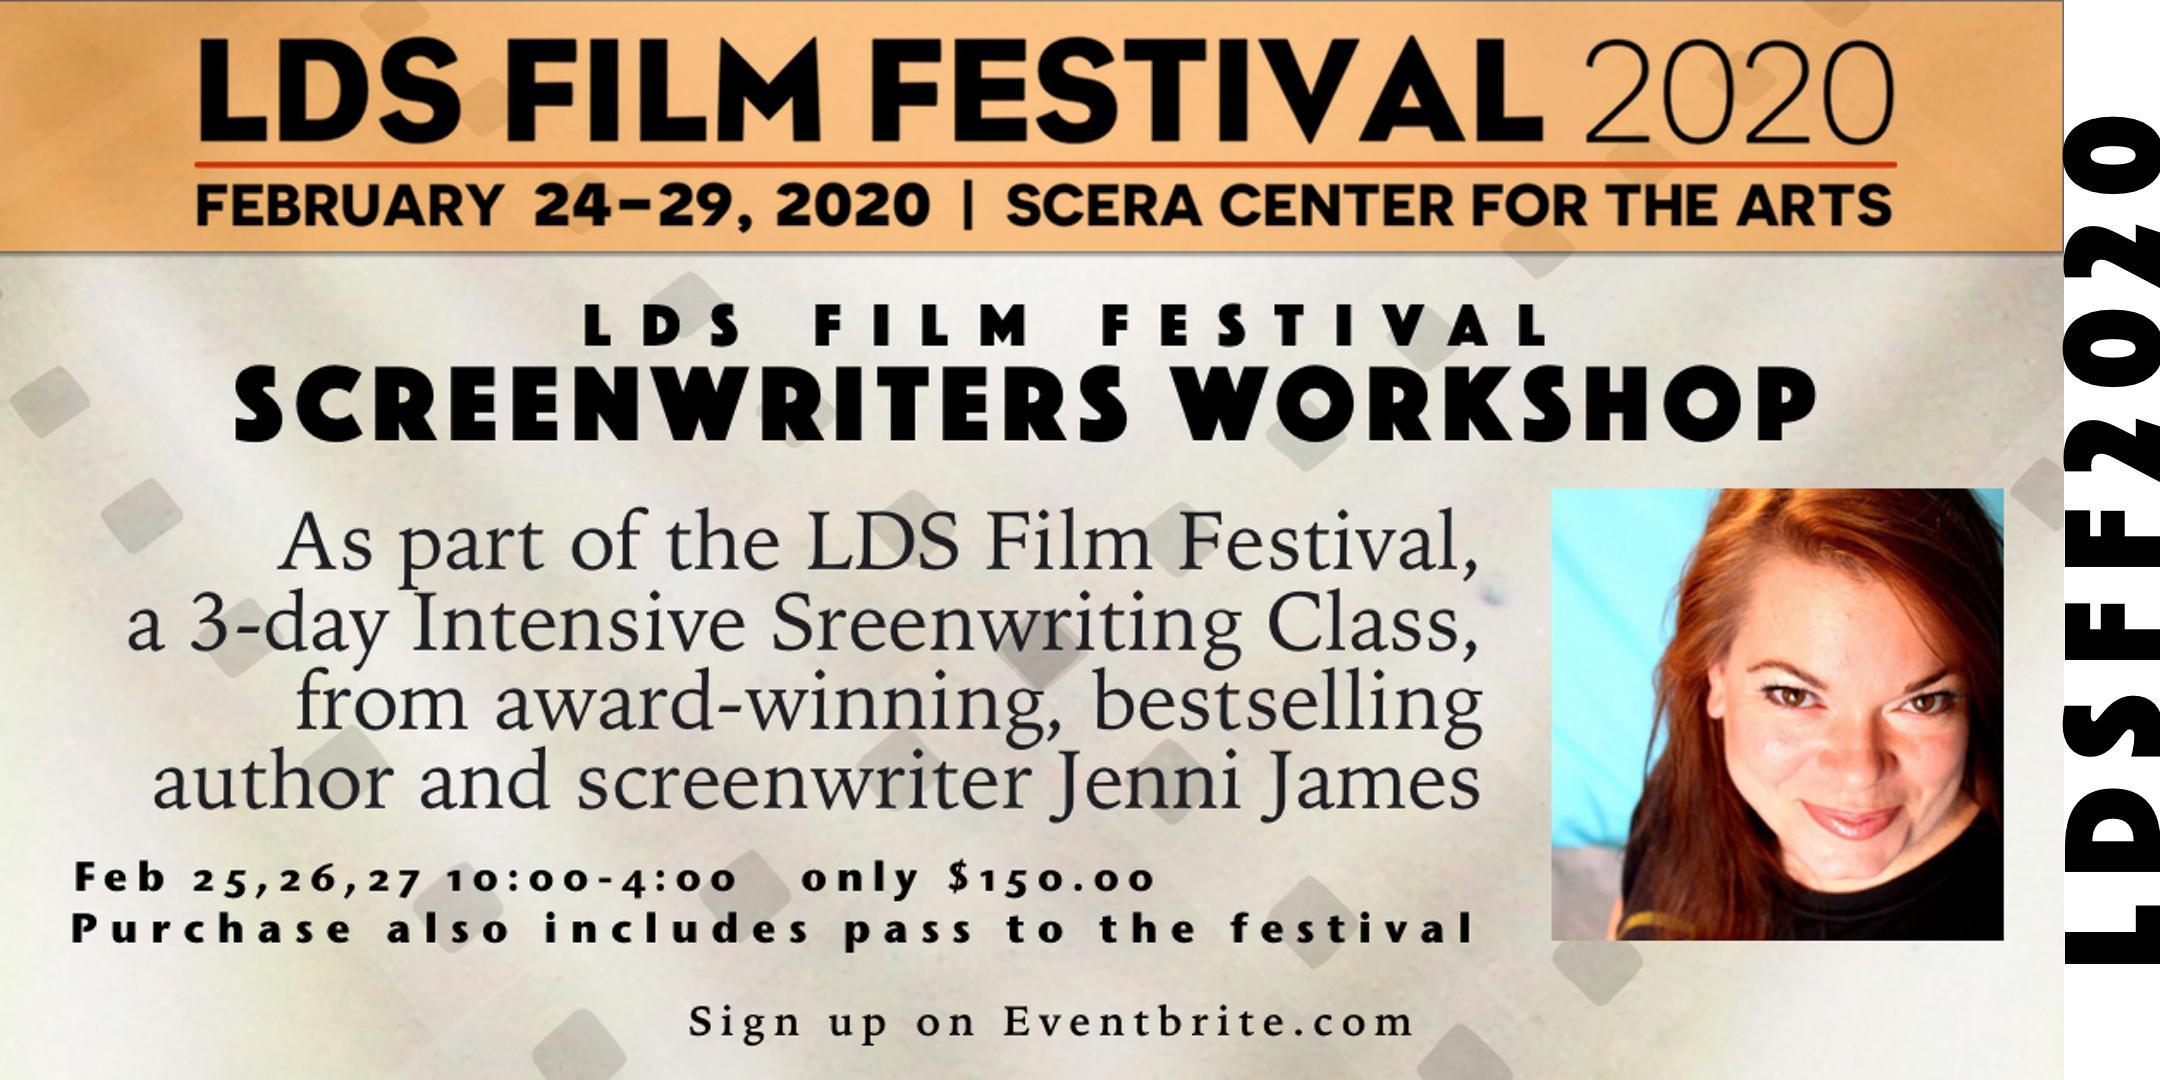 LDS Film Festival Screenwriters Workshop